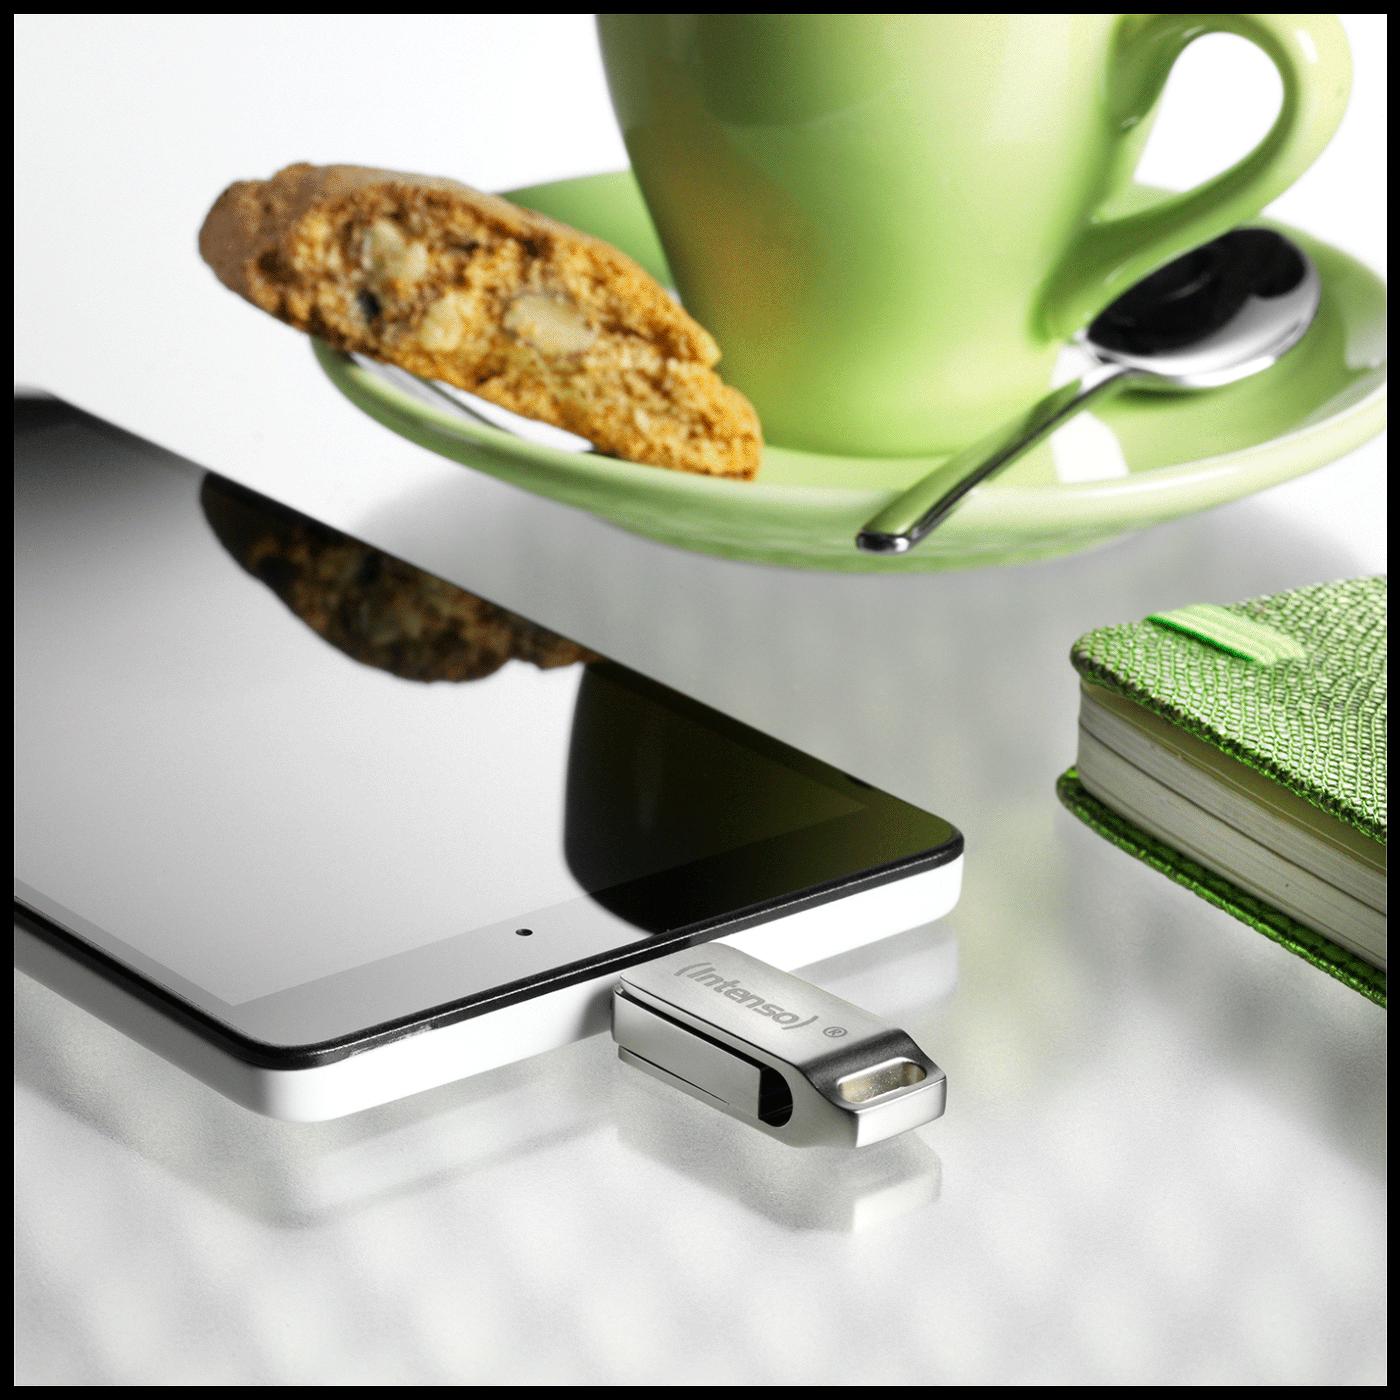 BULK-USB3.0-32GB/cMobile Line Pro